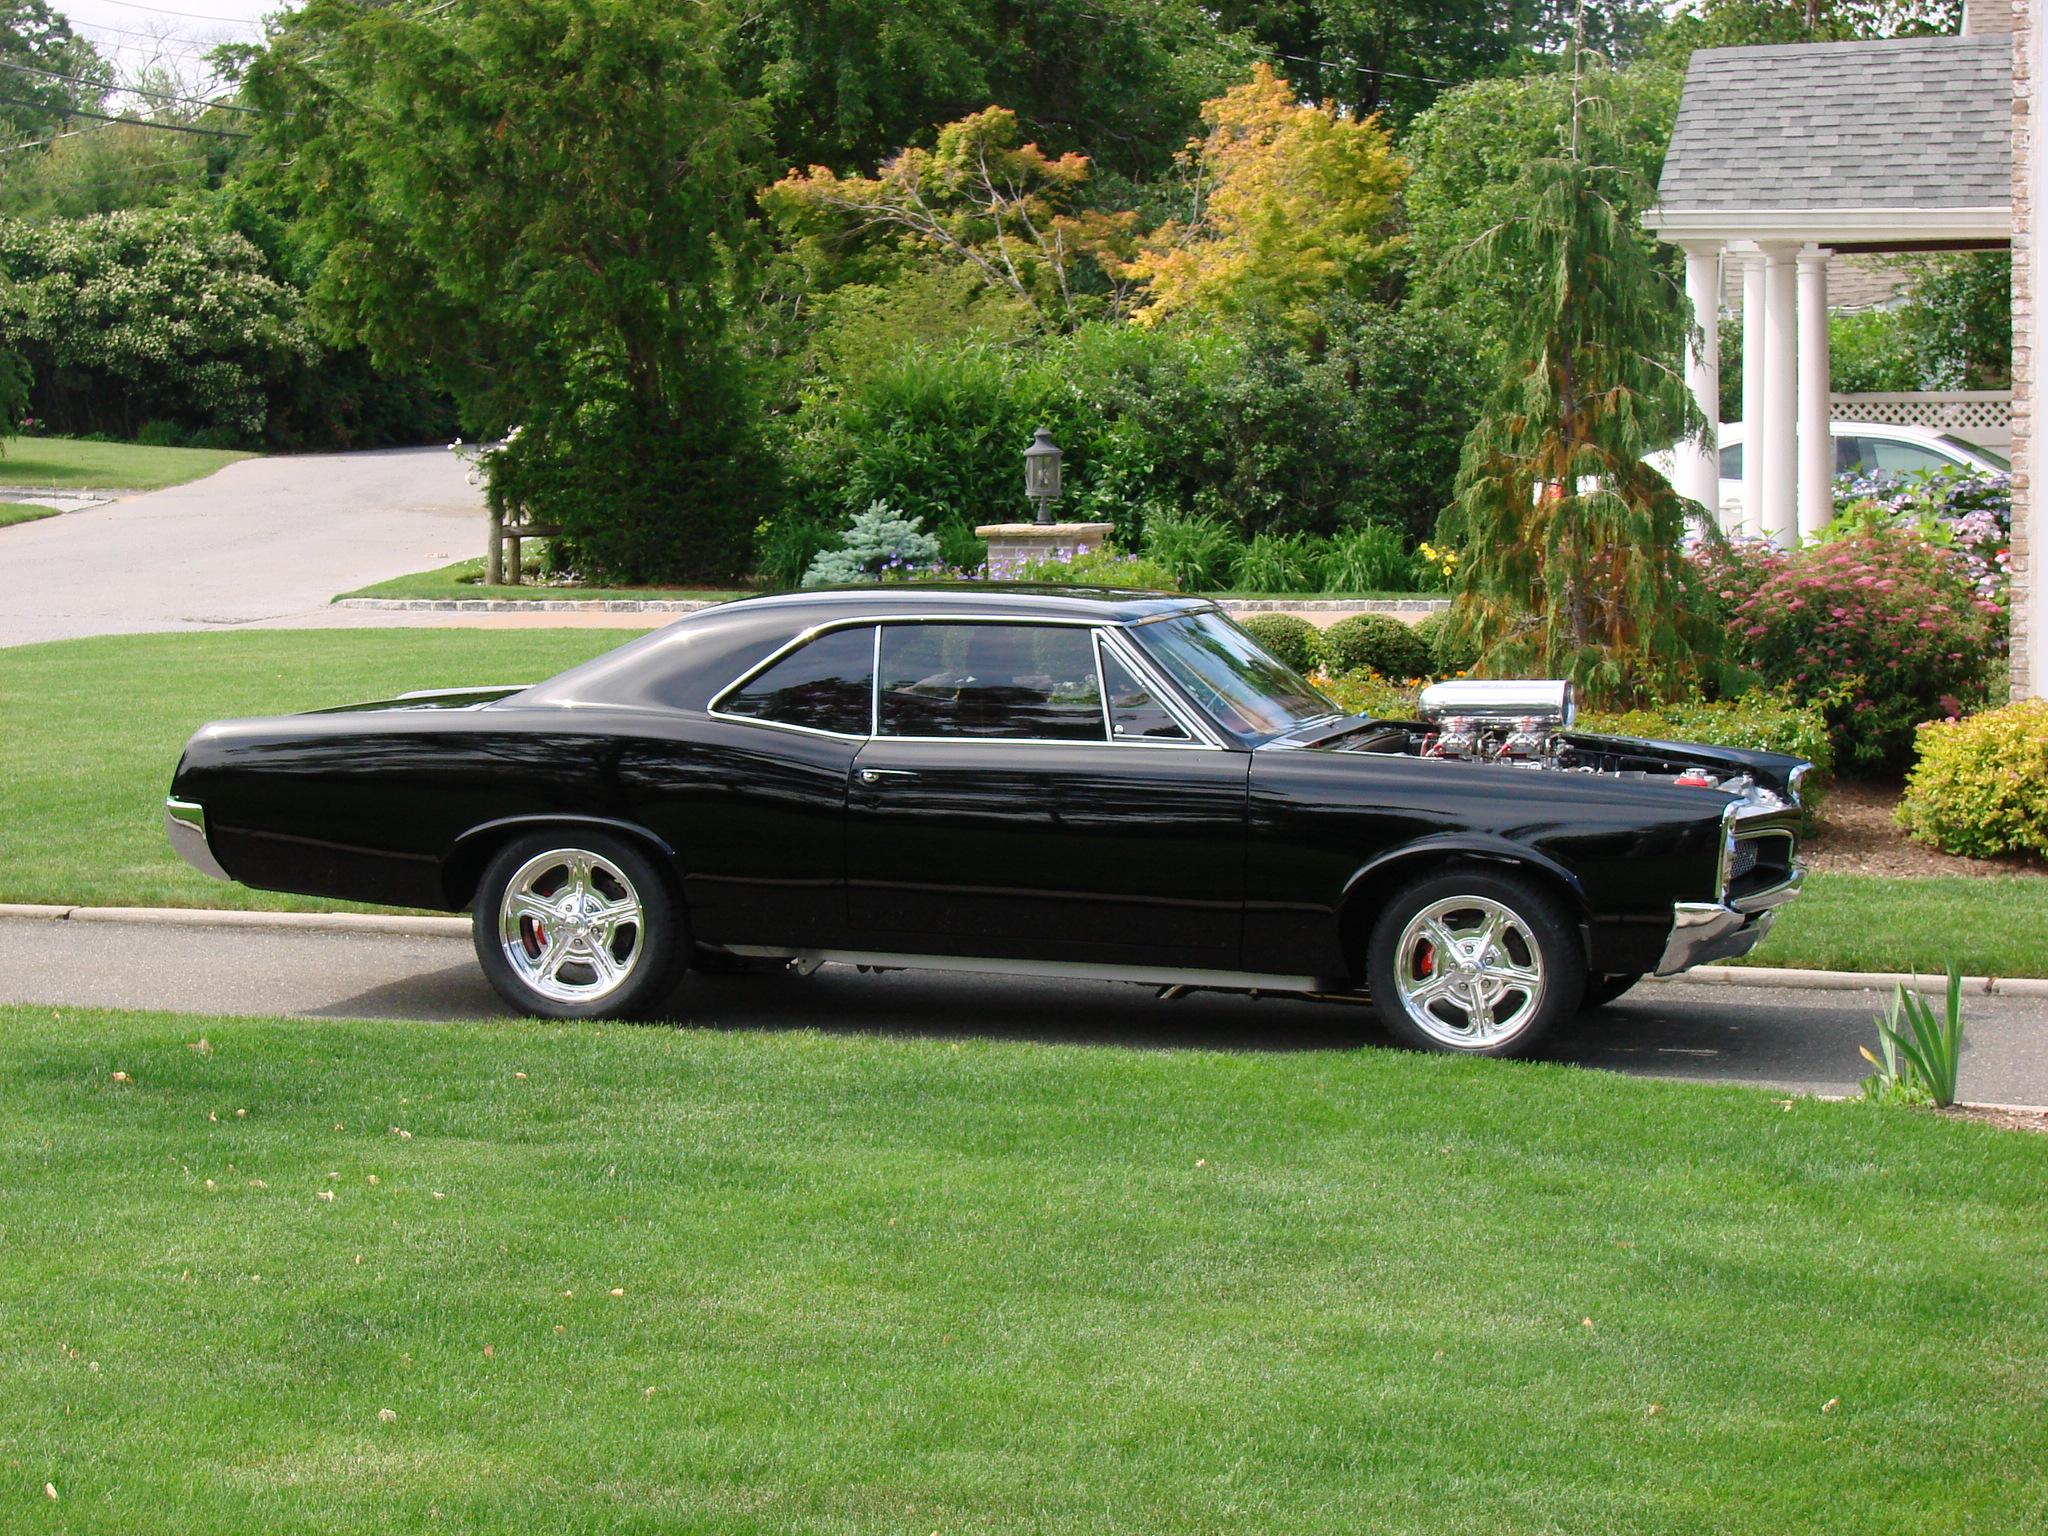 Presenting my new 1968 GTO convertible-gto-001.jpg